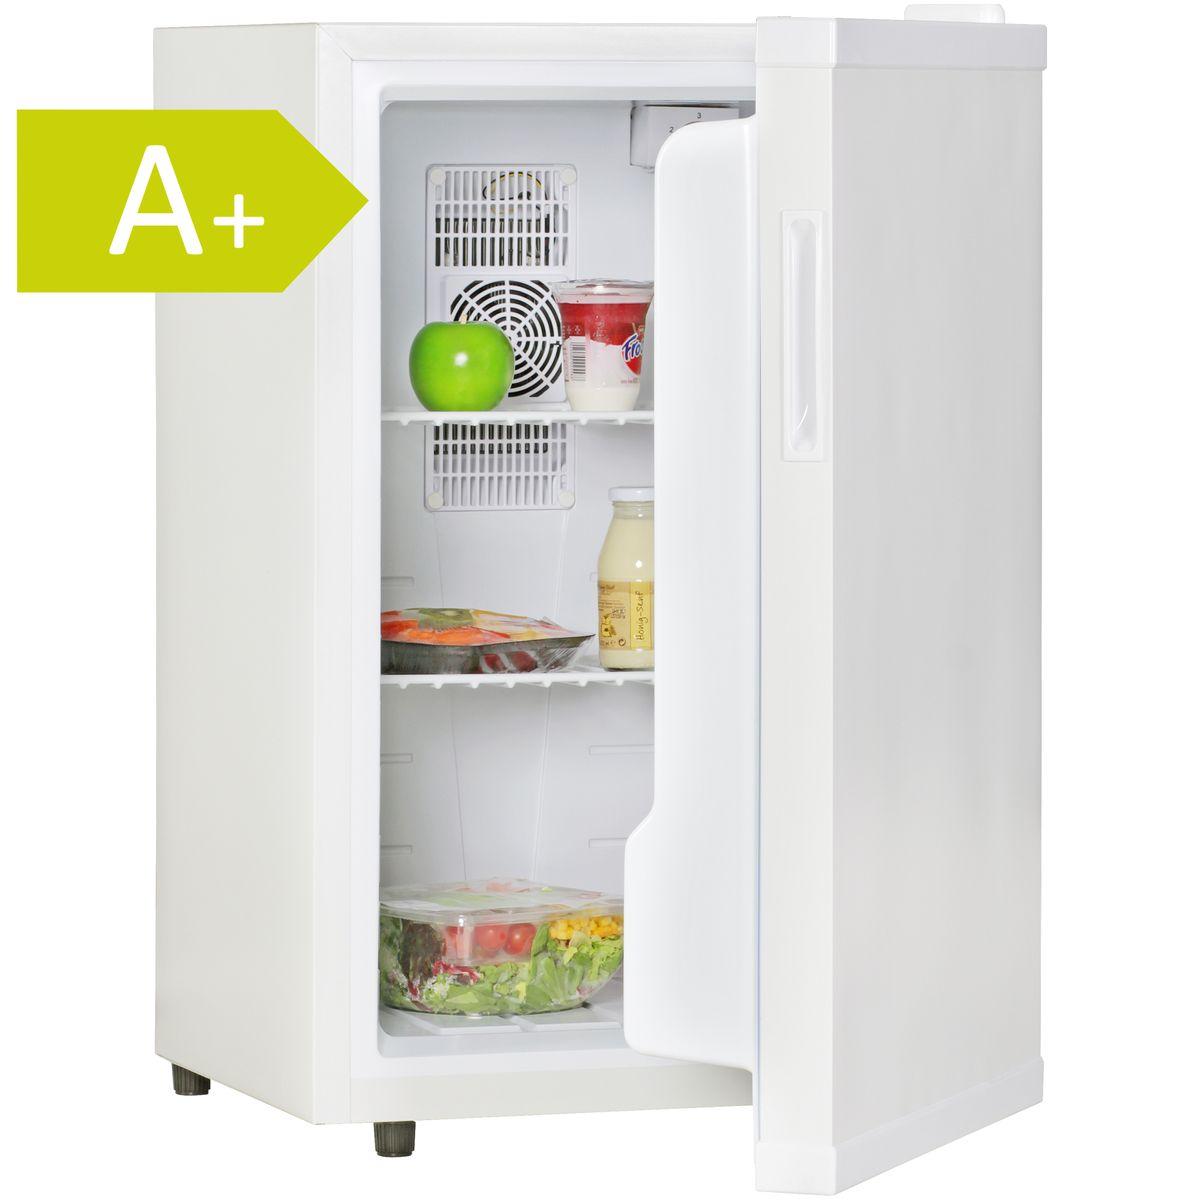 FineBuy Mini Kühlschrank Minibar weiß 65l 5° - 15°C Getränkekühler ...